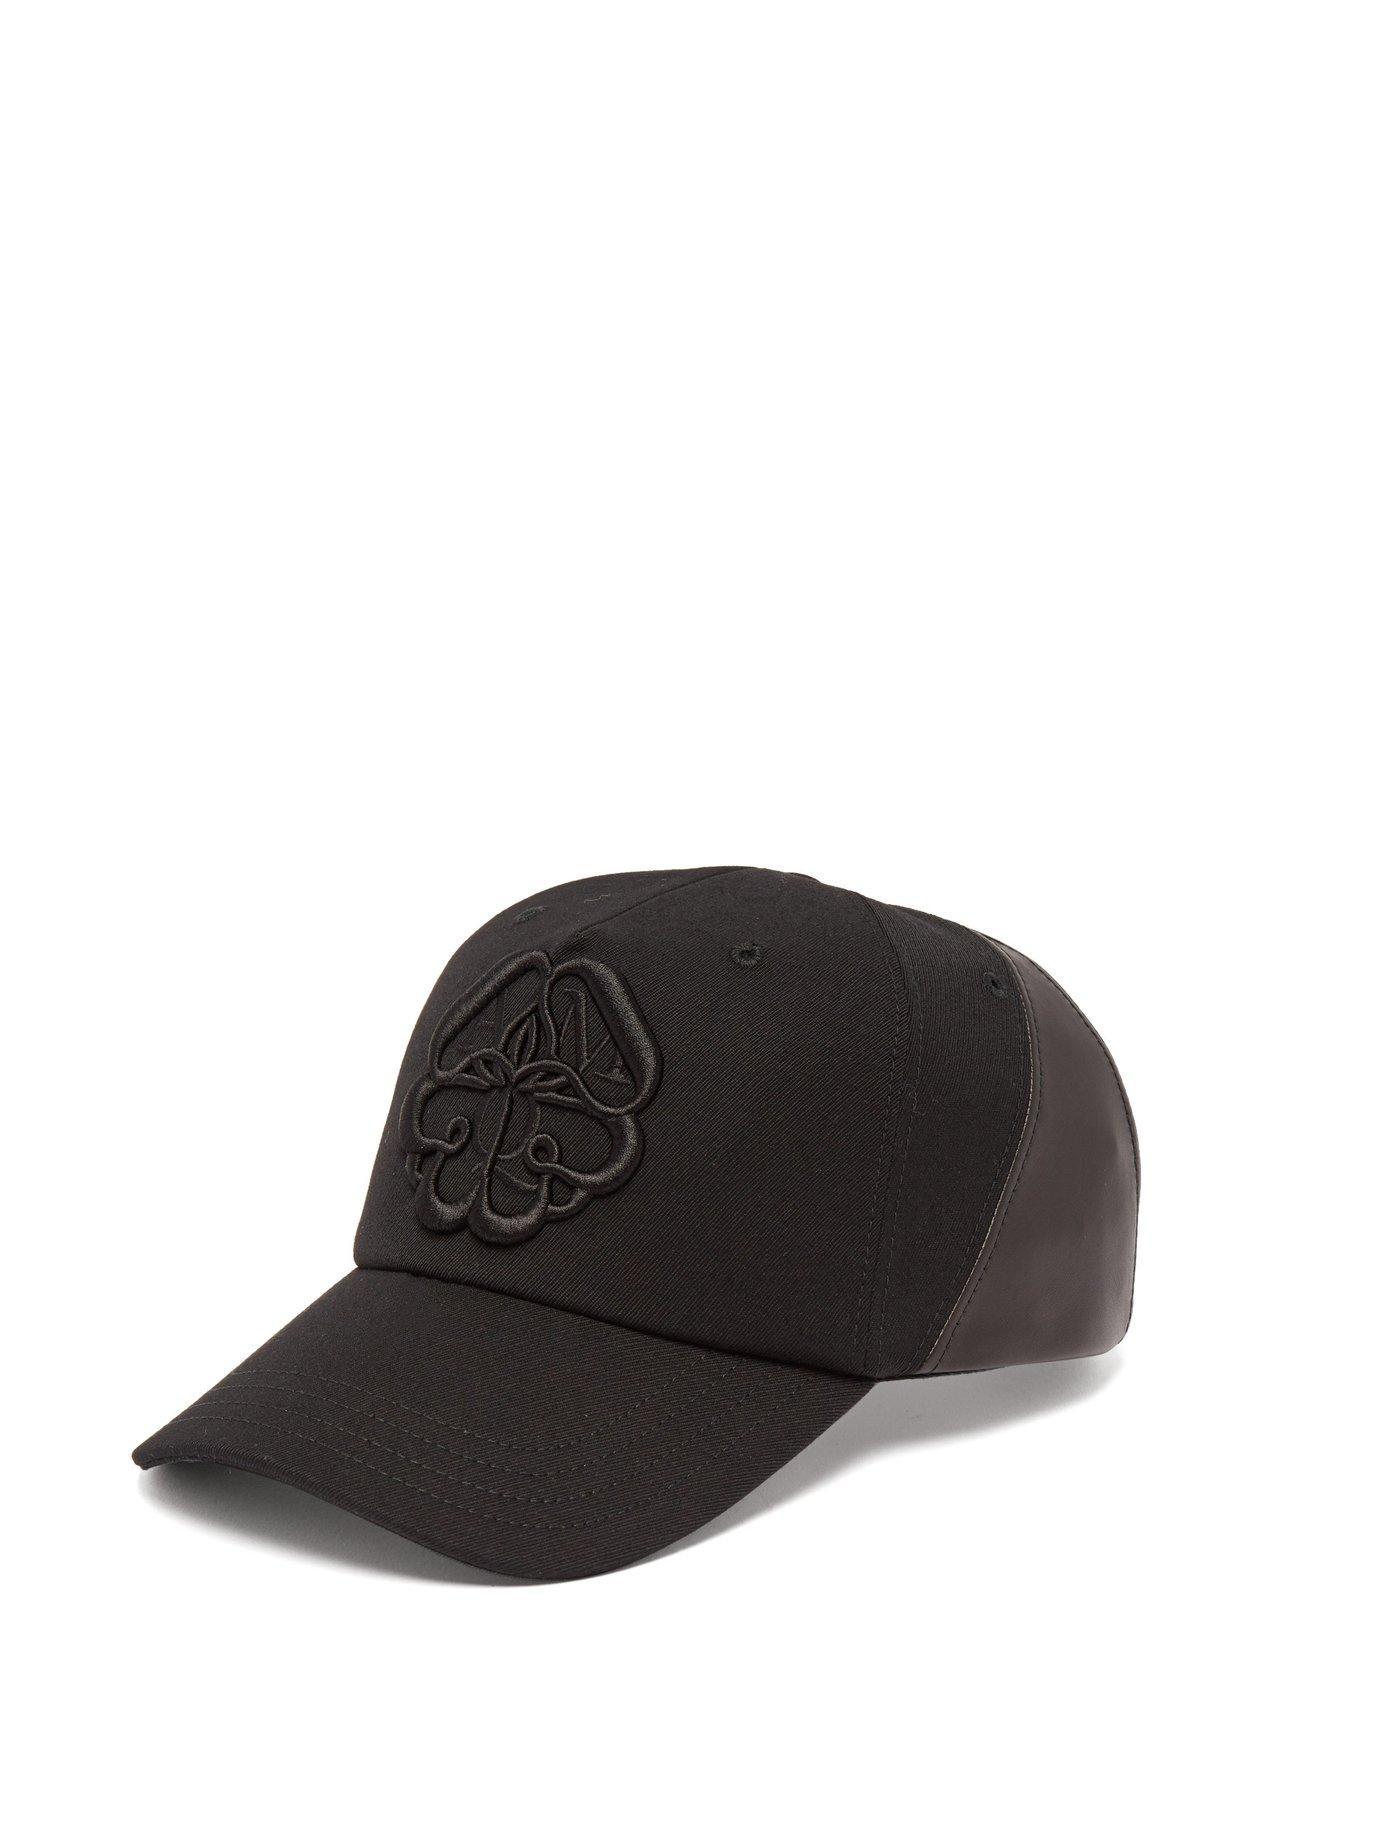 5205200b359 Alexander McQueen. Men s Black Logo Embroidered Lather Panelled Cotton Cap